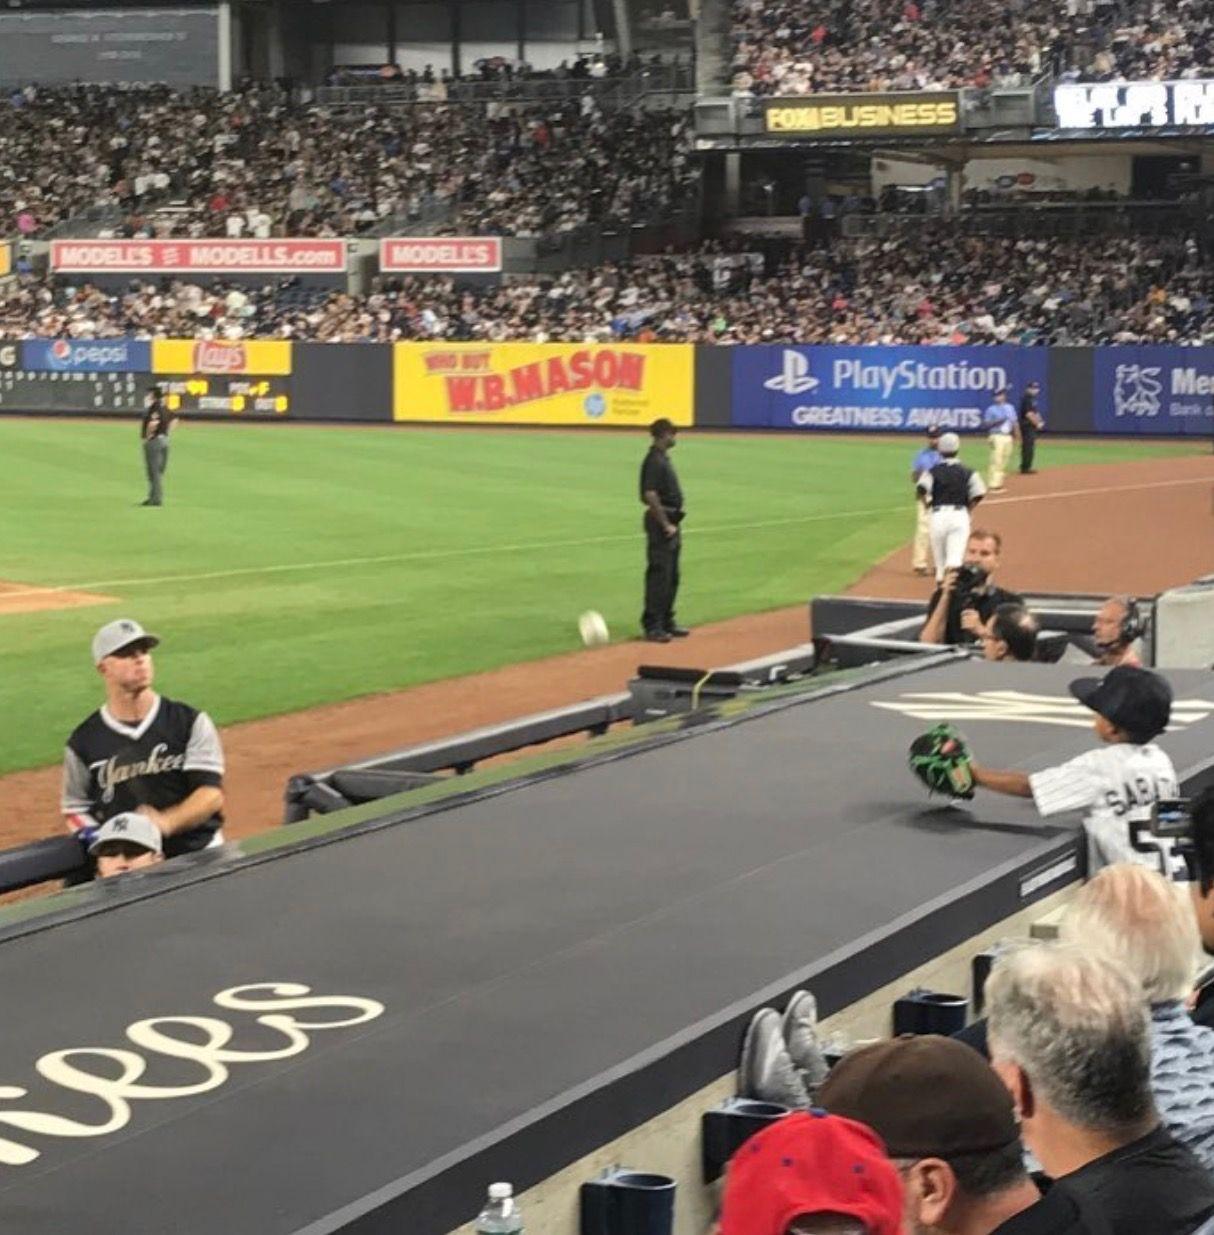 Derek Jeter S Nephew Jalen Playing Catch With Brett Gardner Over The Yankees Dugout Yankees Baseball Yankees New York Yankees